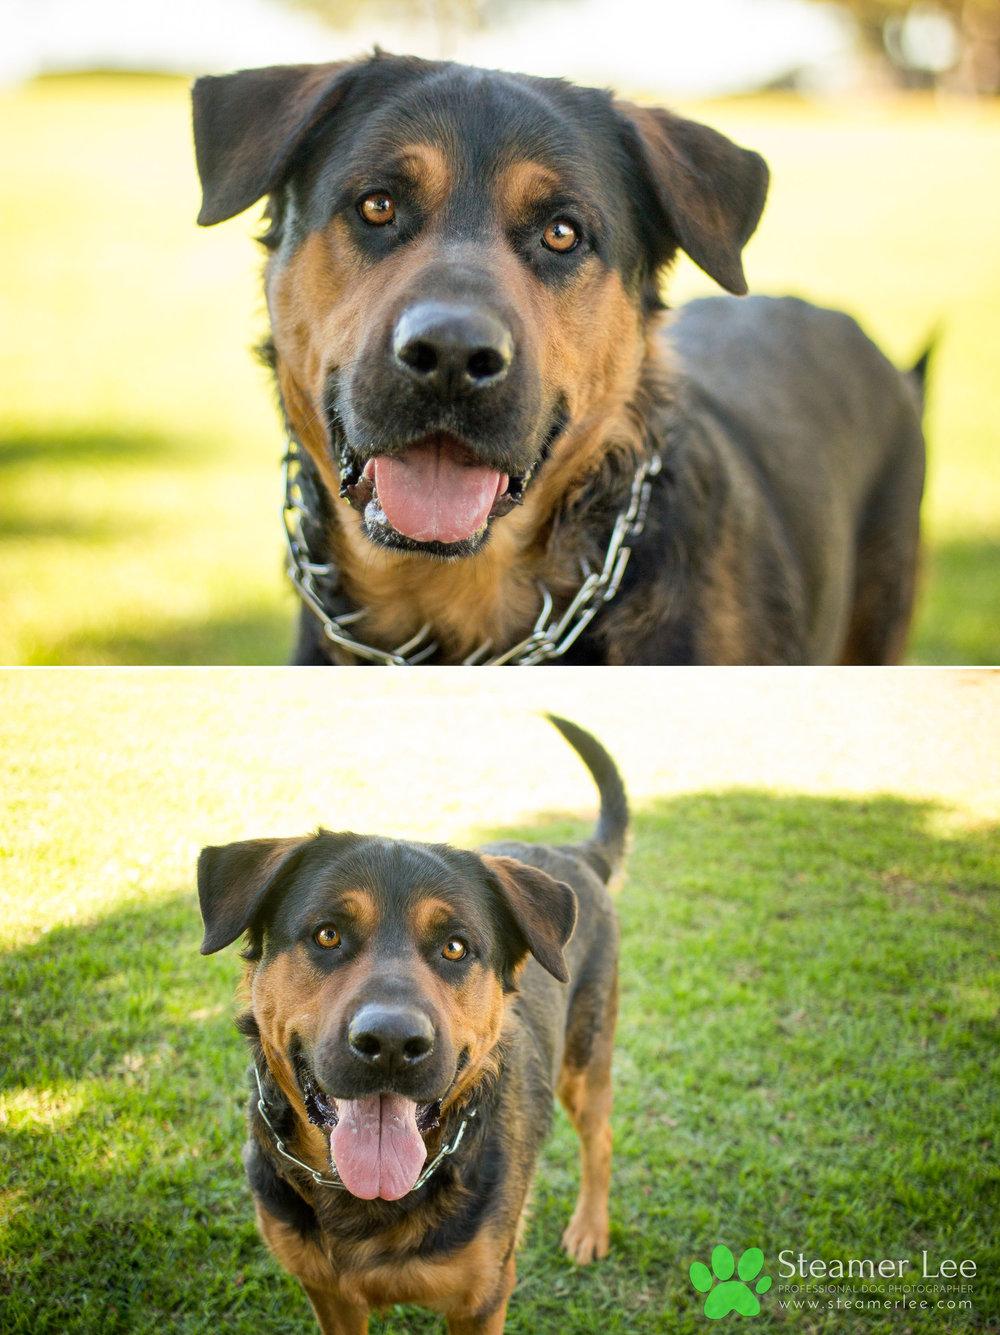 008 Steamer Lee Dog Photography - Orange County Dog Photography - German Shepherd Rottweiler Mix_Poodle.JPG